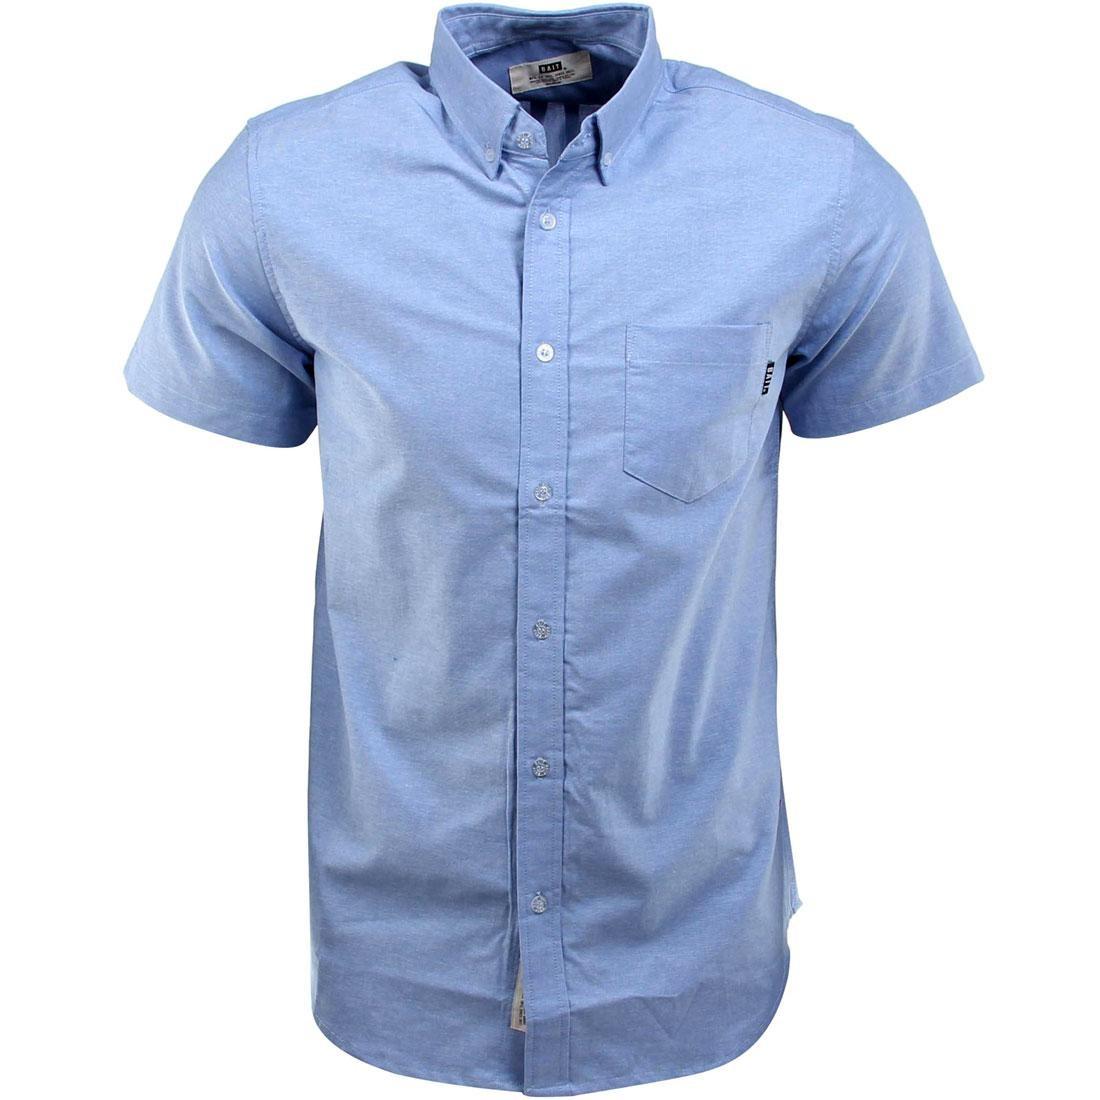 BAIT Oxford Short Sleeve Shirt (blue)